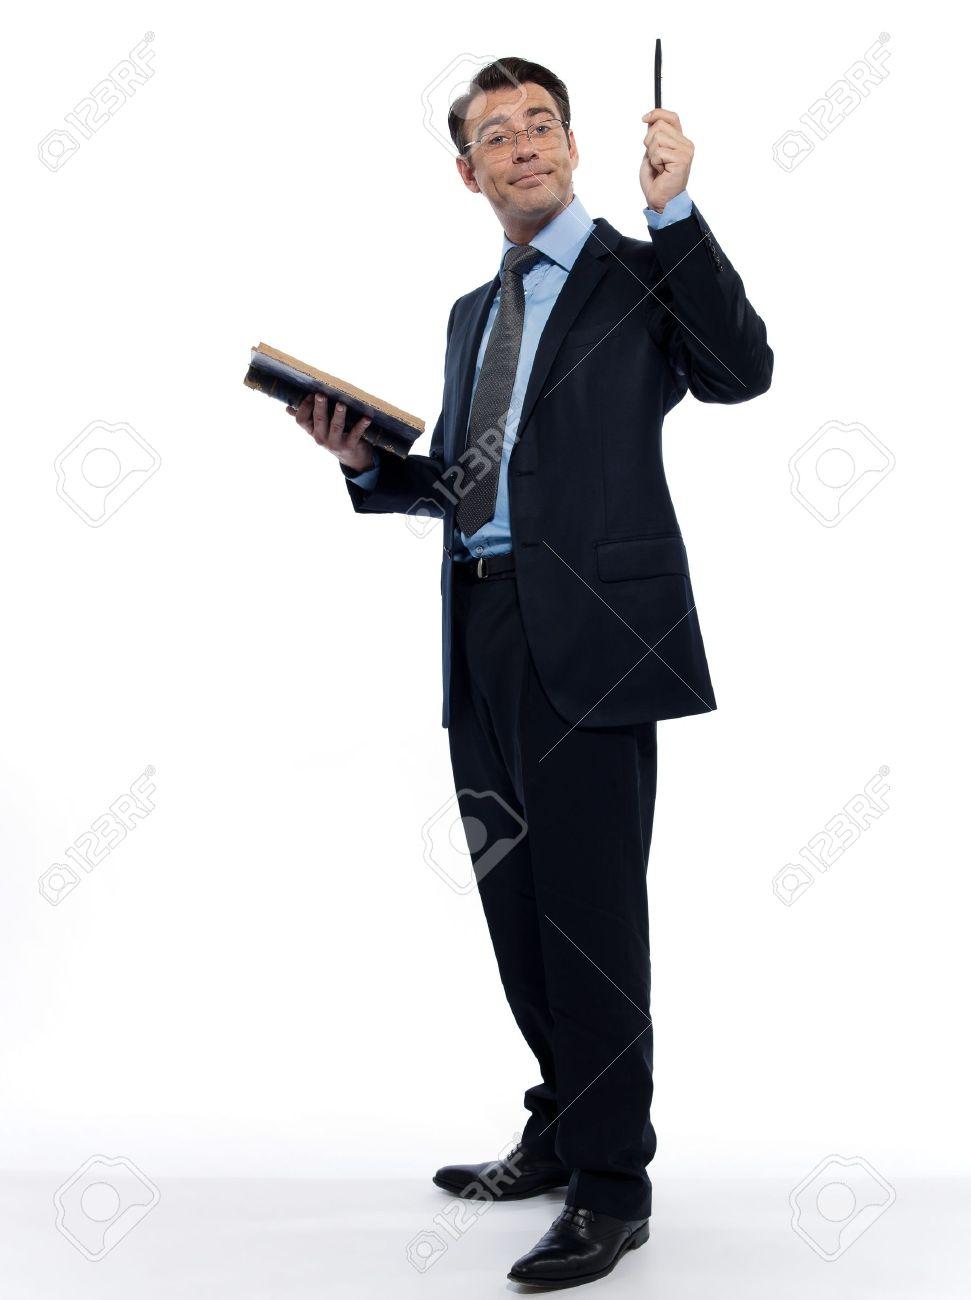 one man caucasian professor teacher teaching  reading an ancient book isolated studio on white background Stock Photo - 12710748